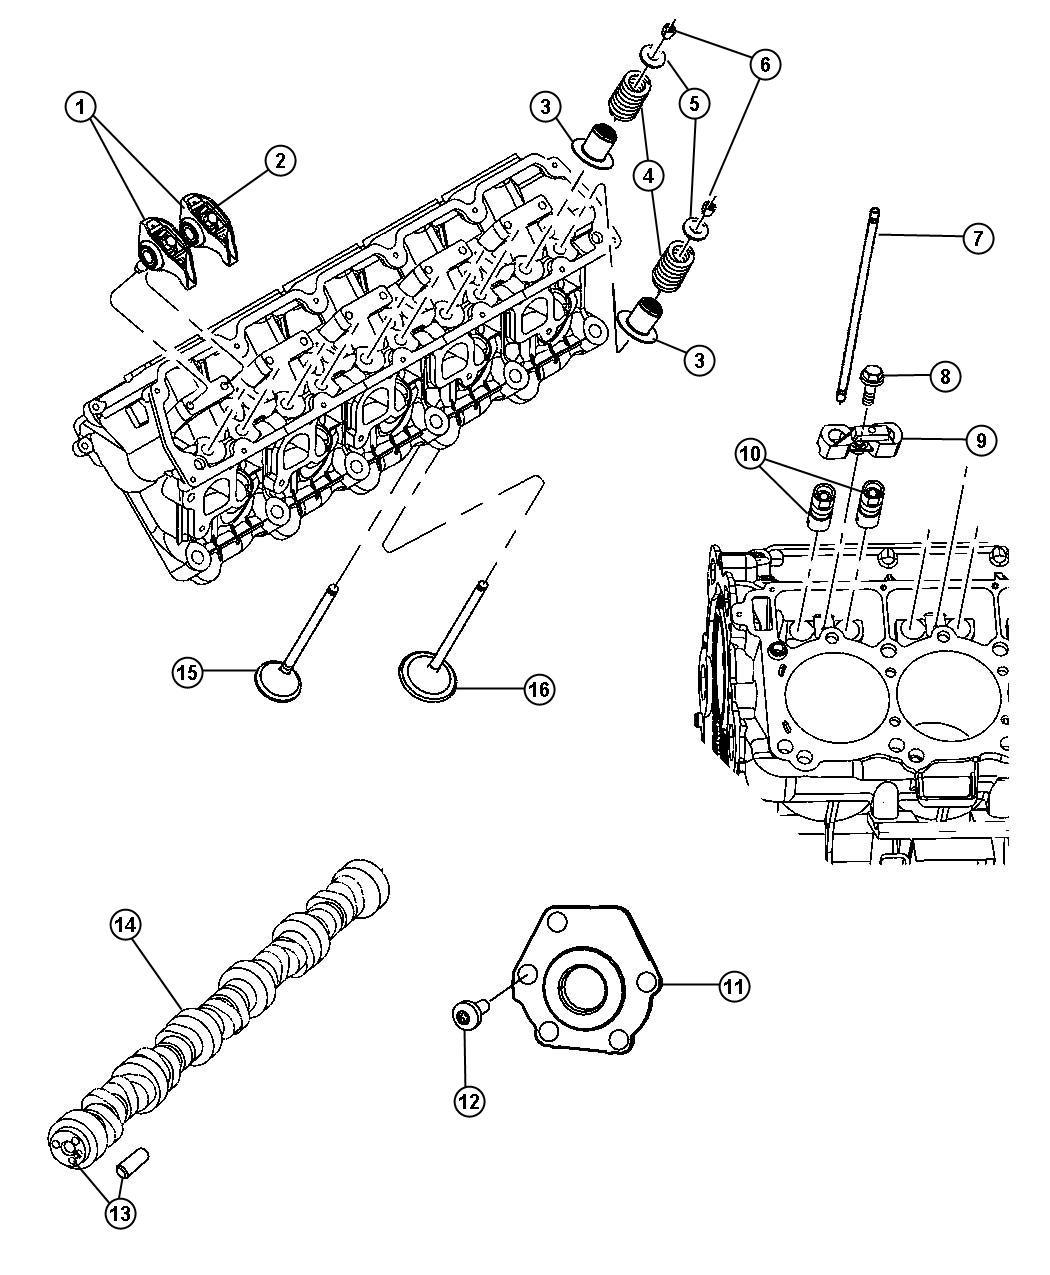 Dodge Viper Plate Camshaft Thrust Valvetrain Block